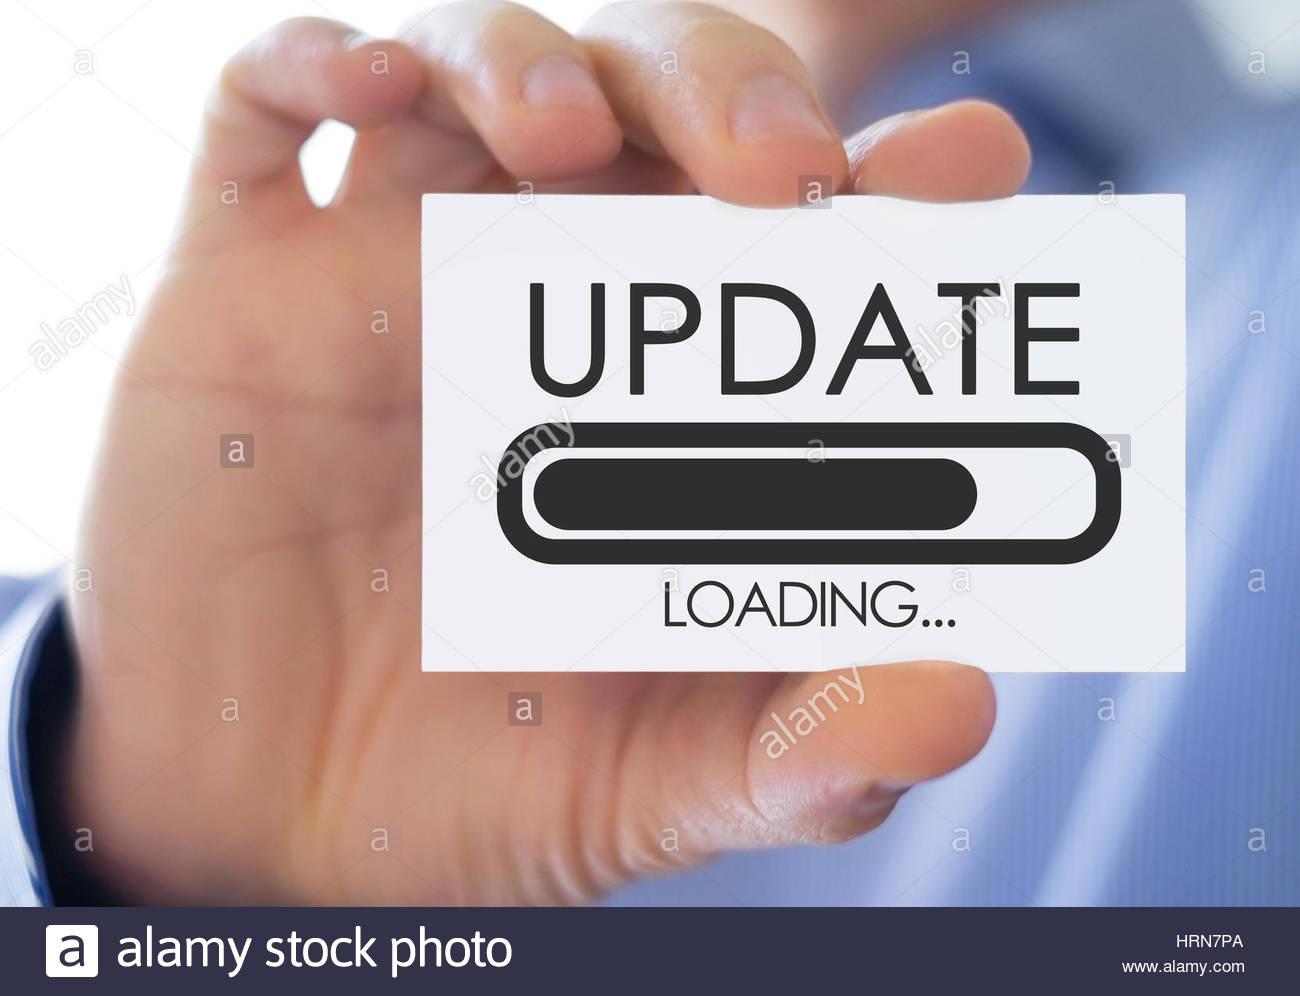 Update loading process - Stock Image